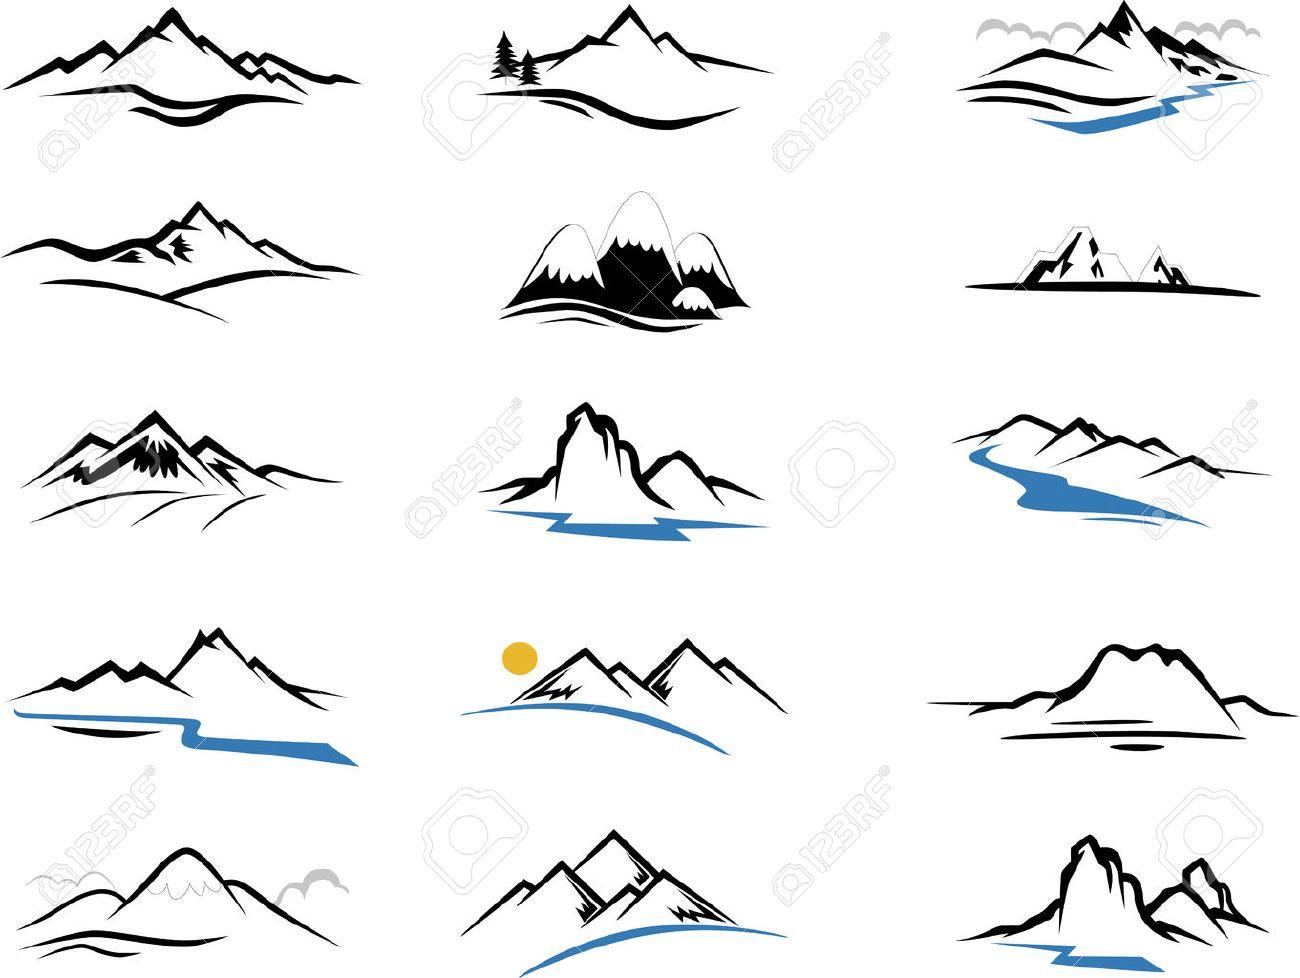 Mountains Icons cartoon for you design - 44559302